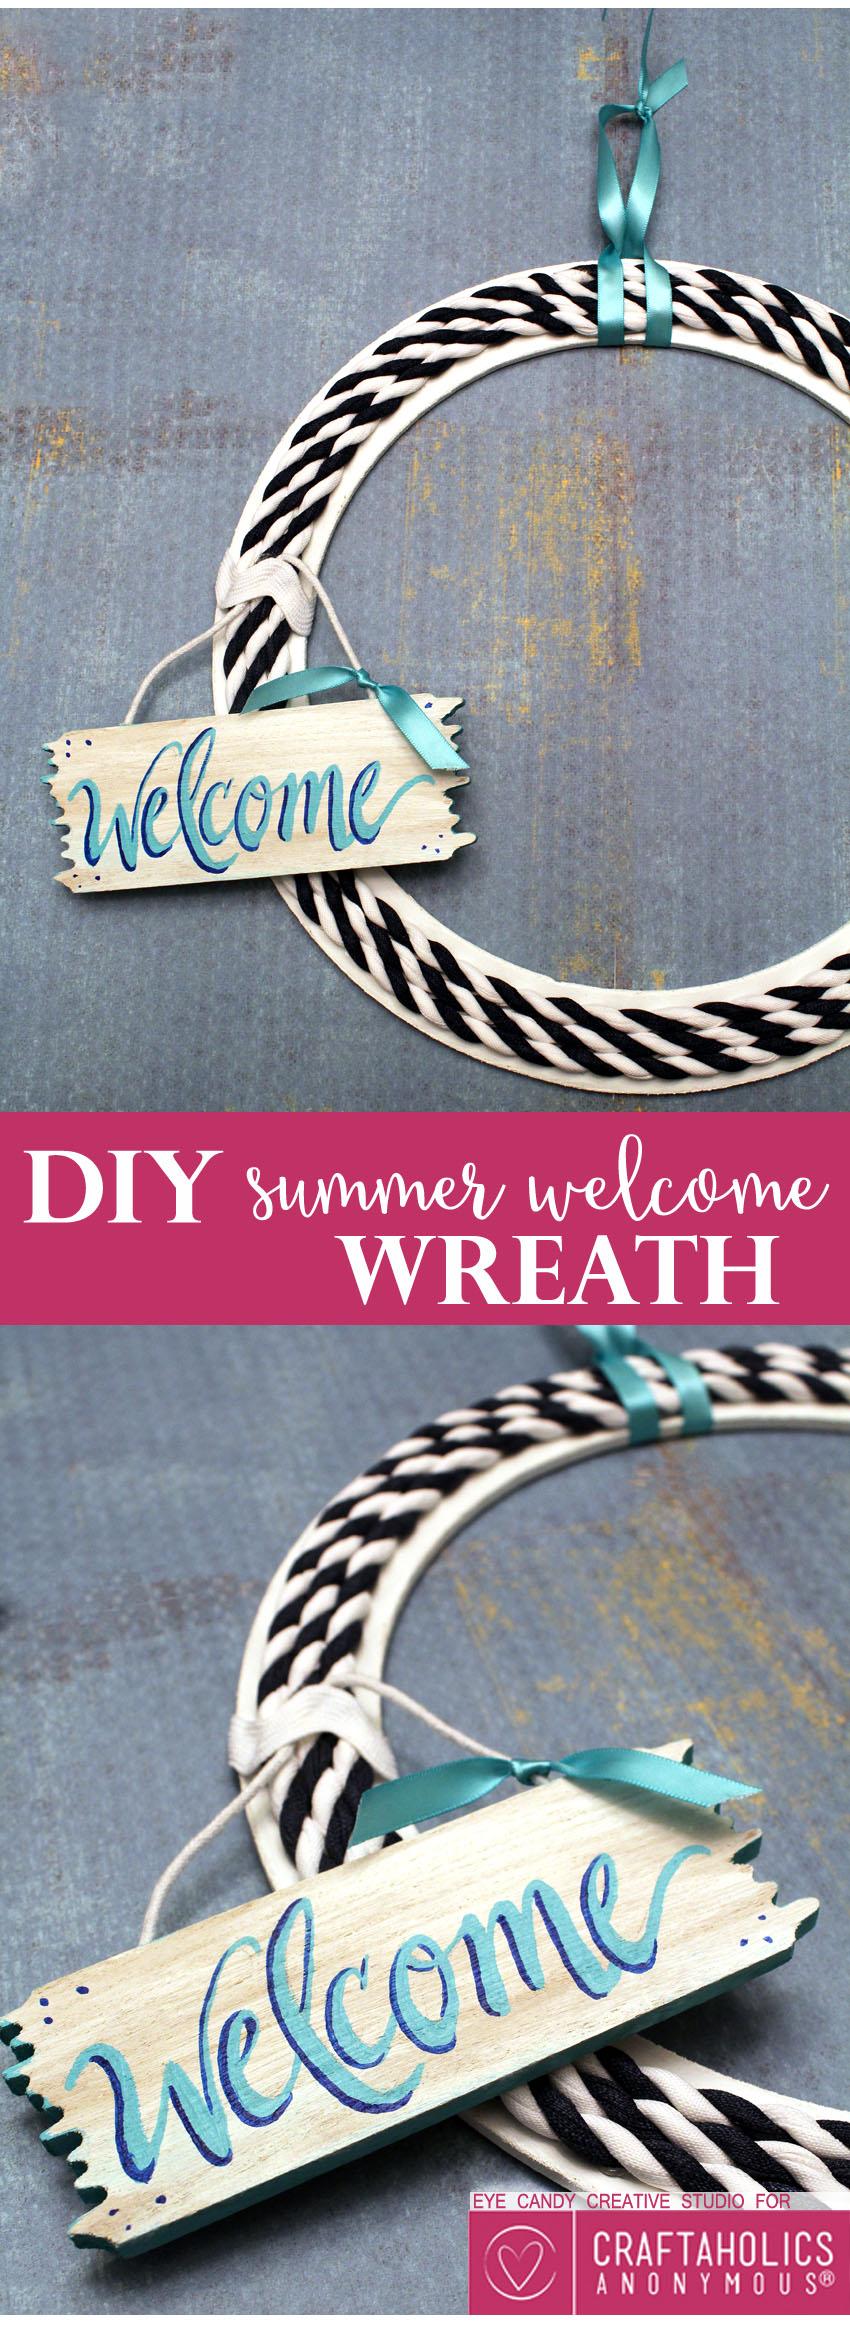 DIY Summer Welcome Wreath